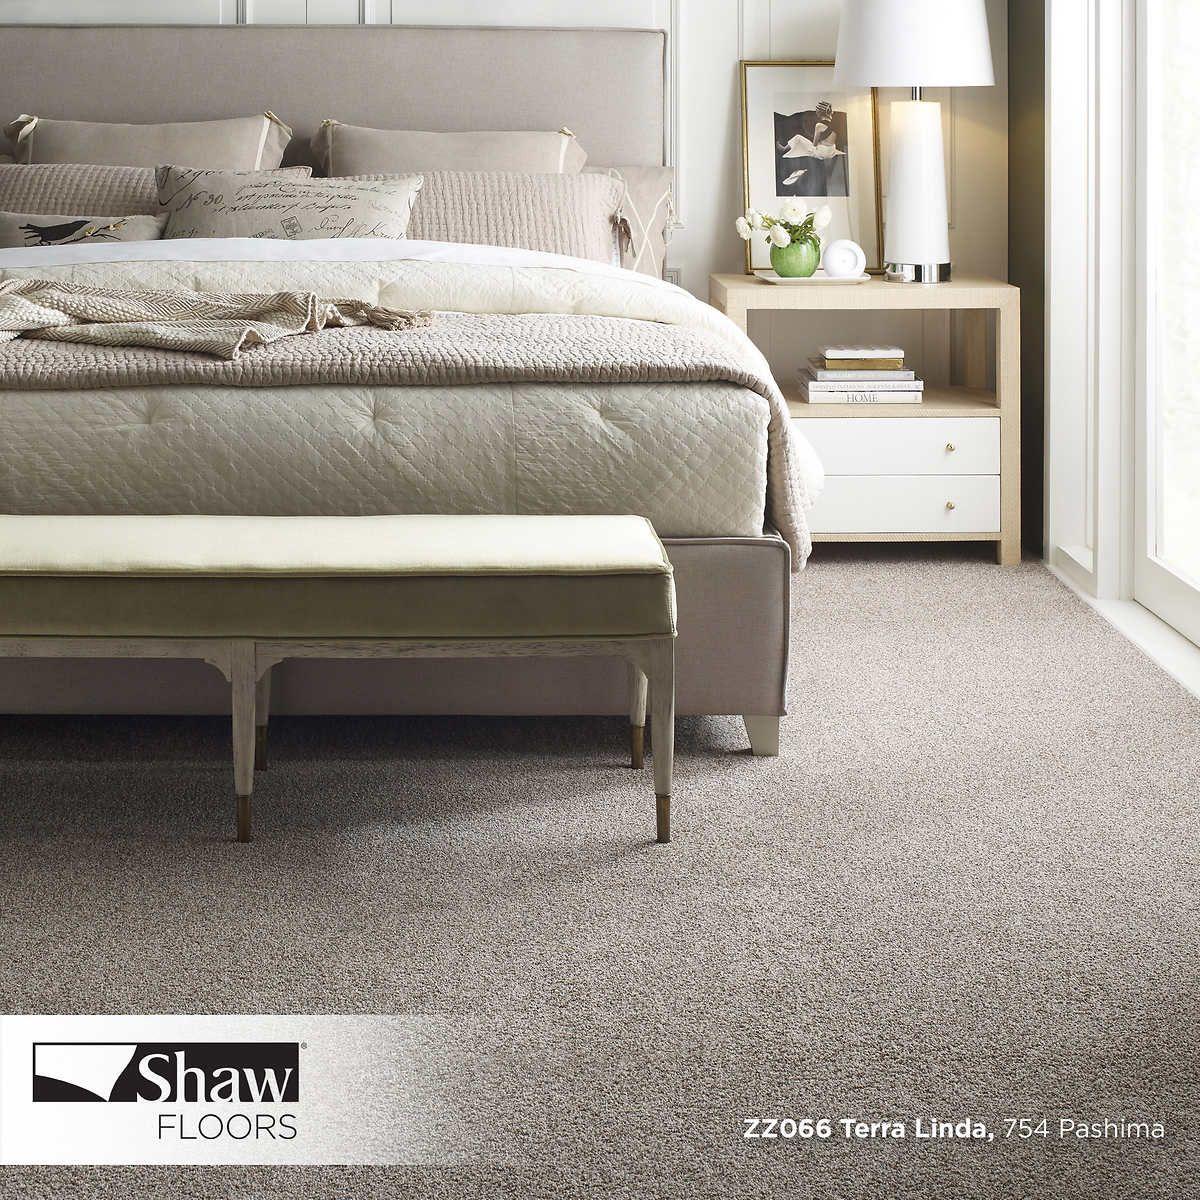 Shaw Carpet, Hardwood & Laminate Flooring (With images